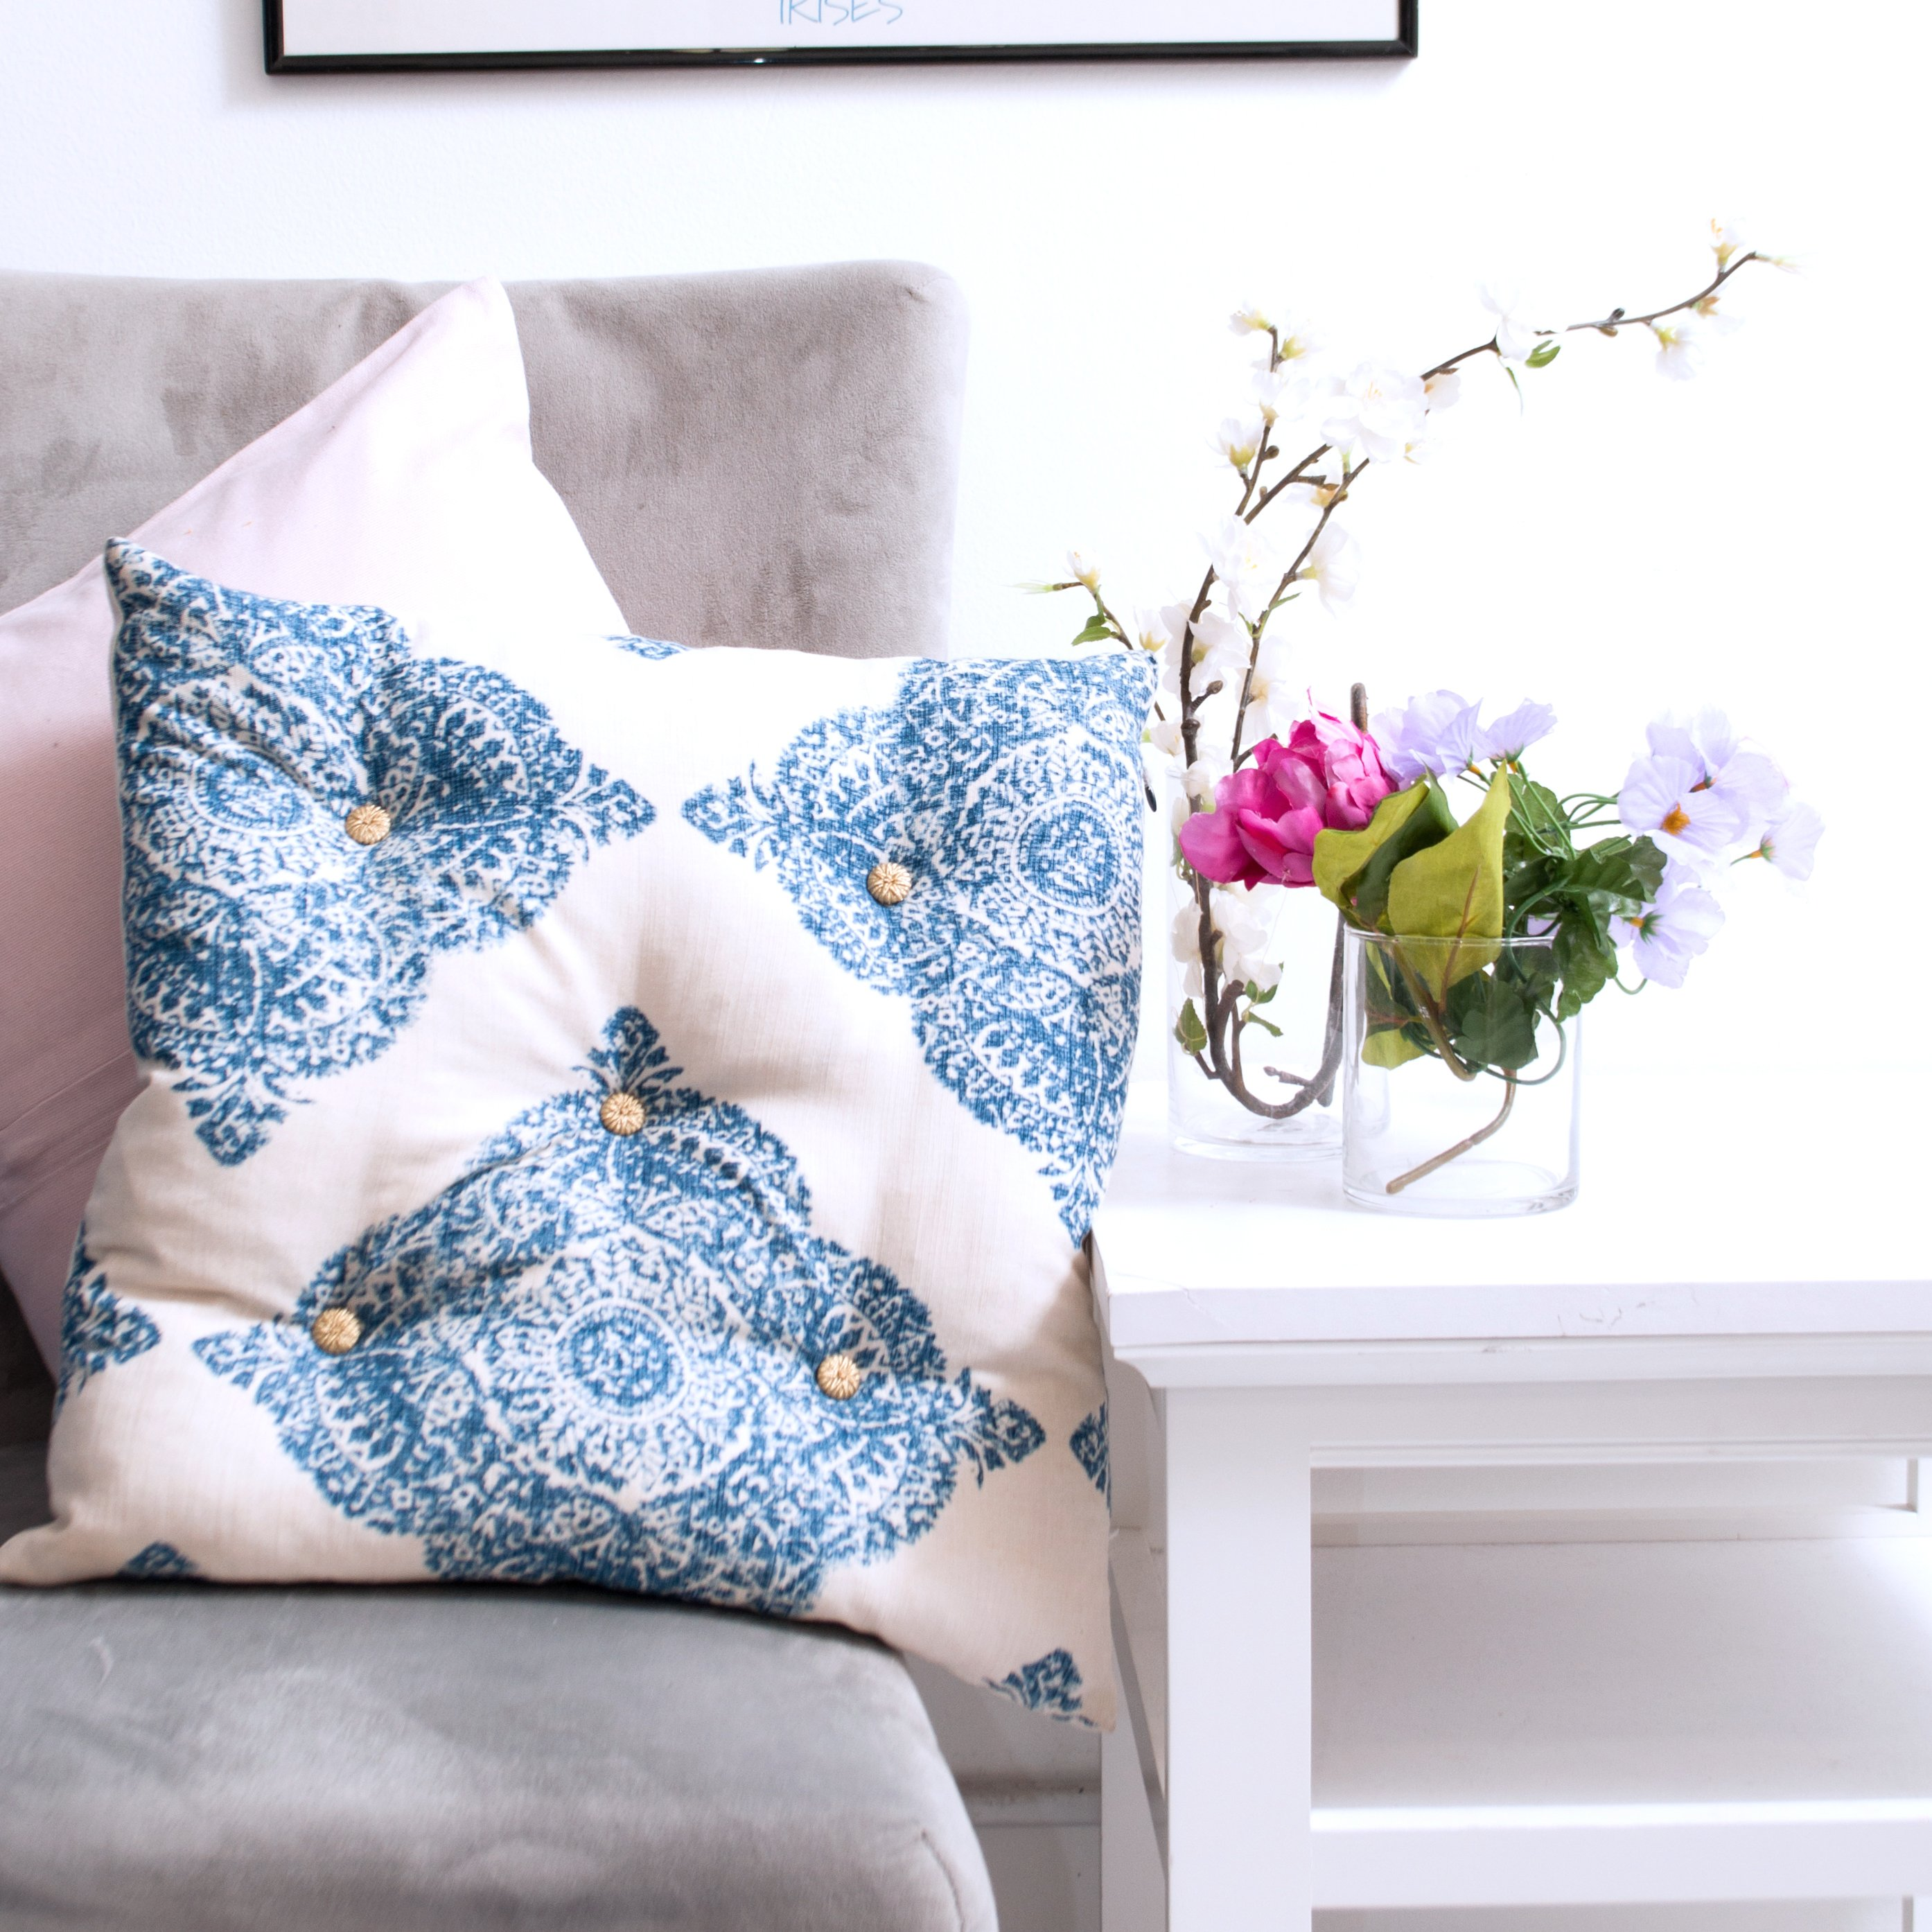 Diy Tufted Pillow M J Blog